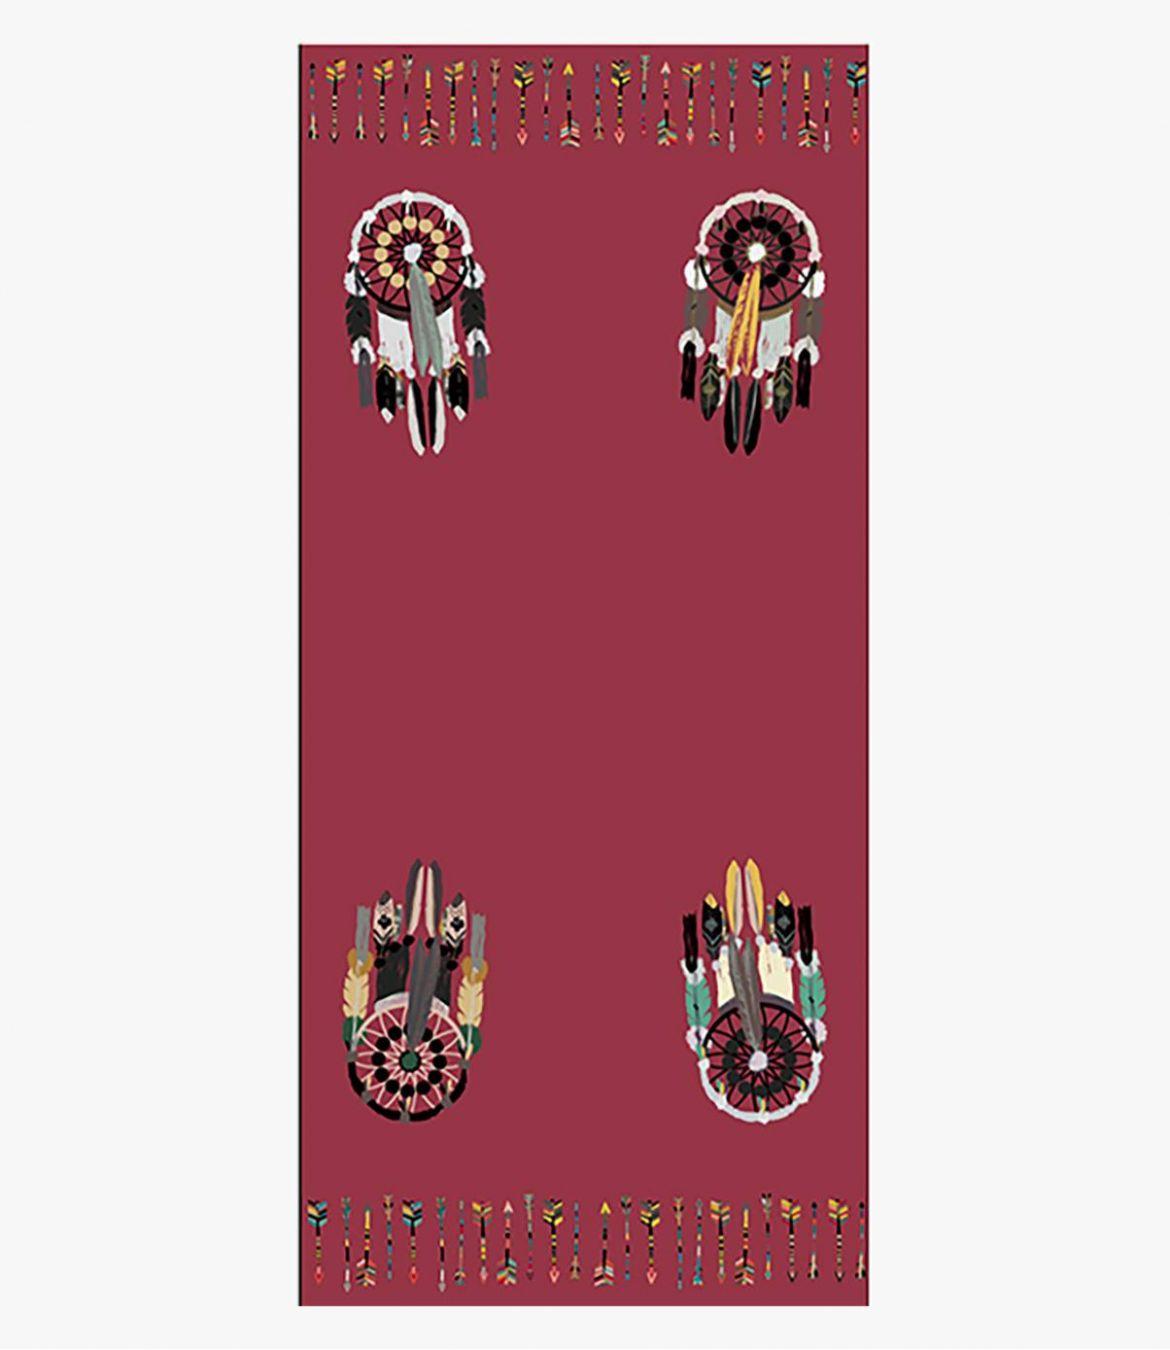 REVE Women's Wool Scarf 90x200 cm Storiatipic - 7